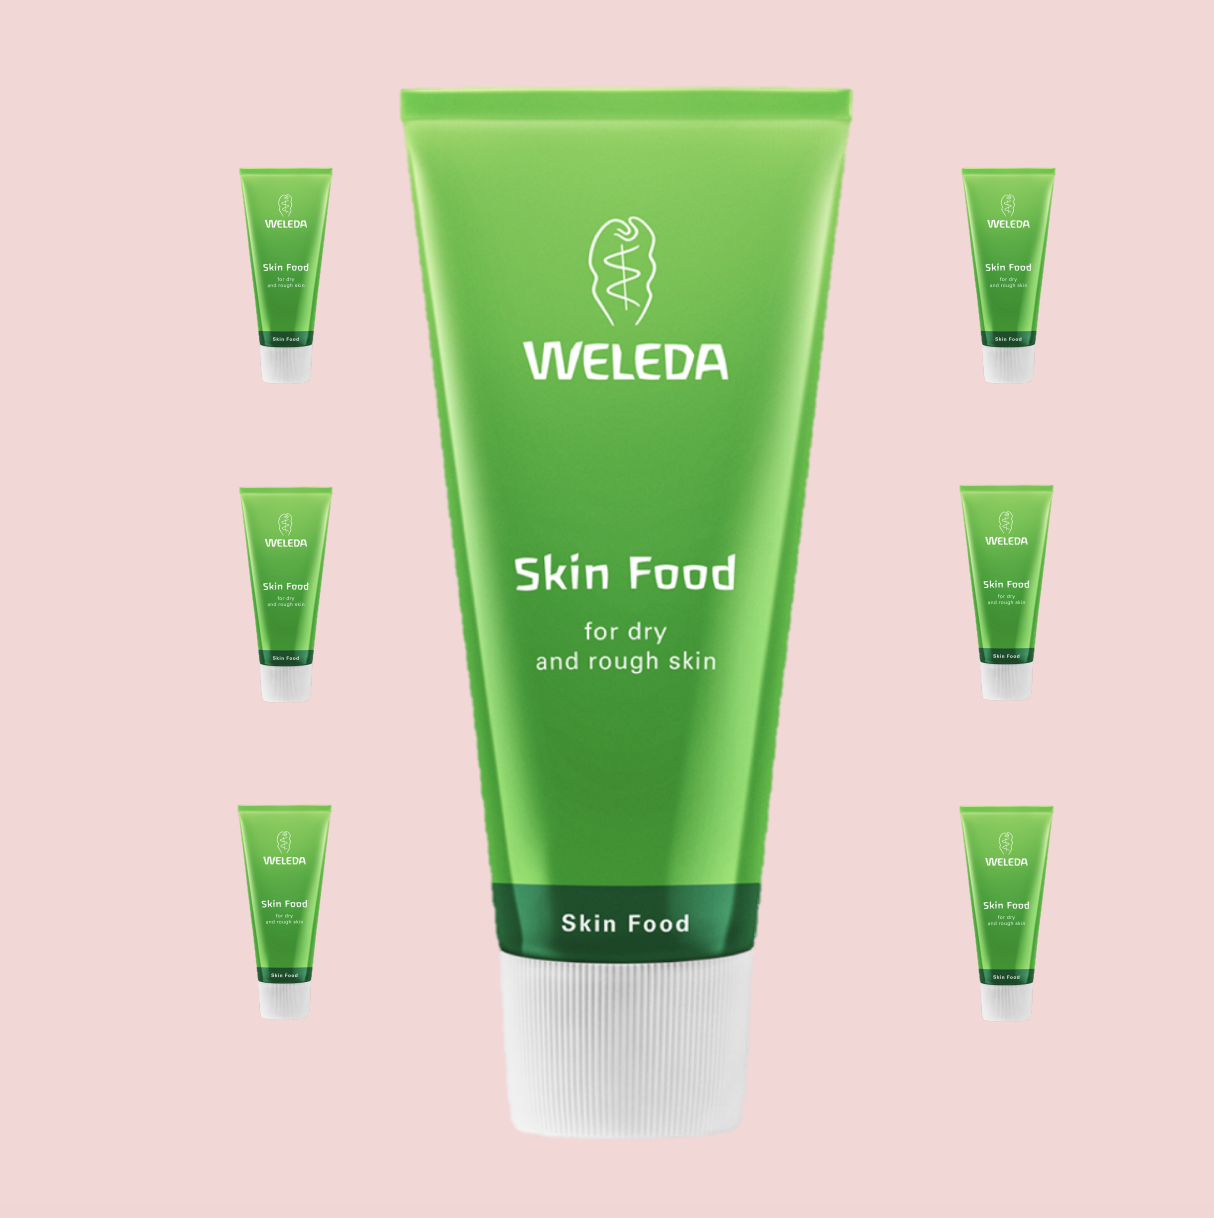 Weleda Skin Food Review - AMOUR OPHELIA